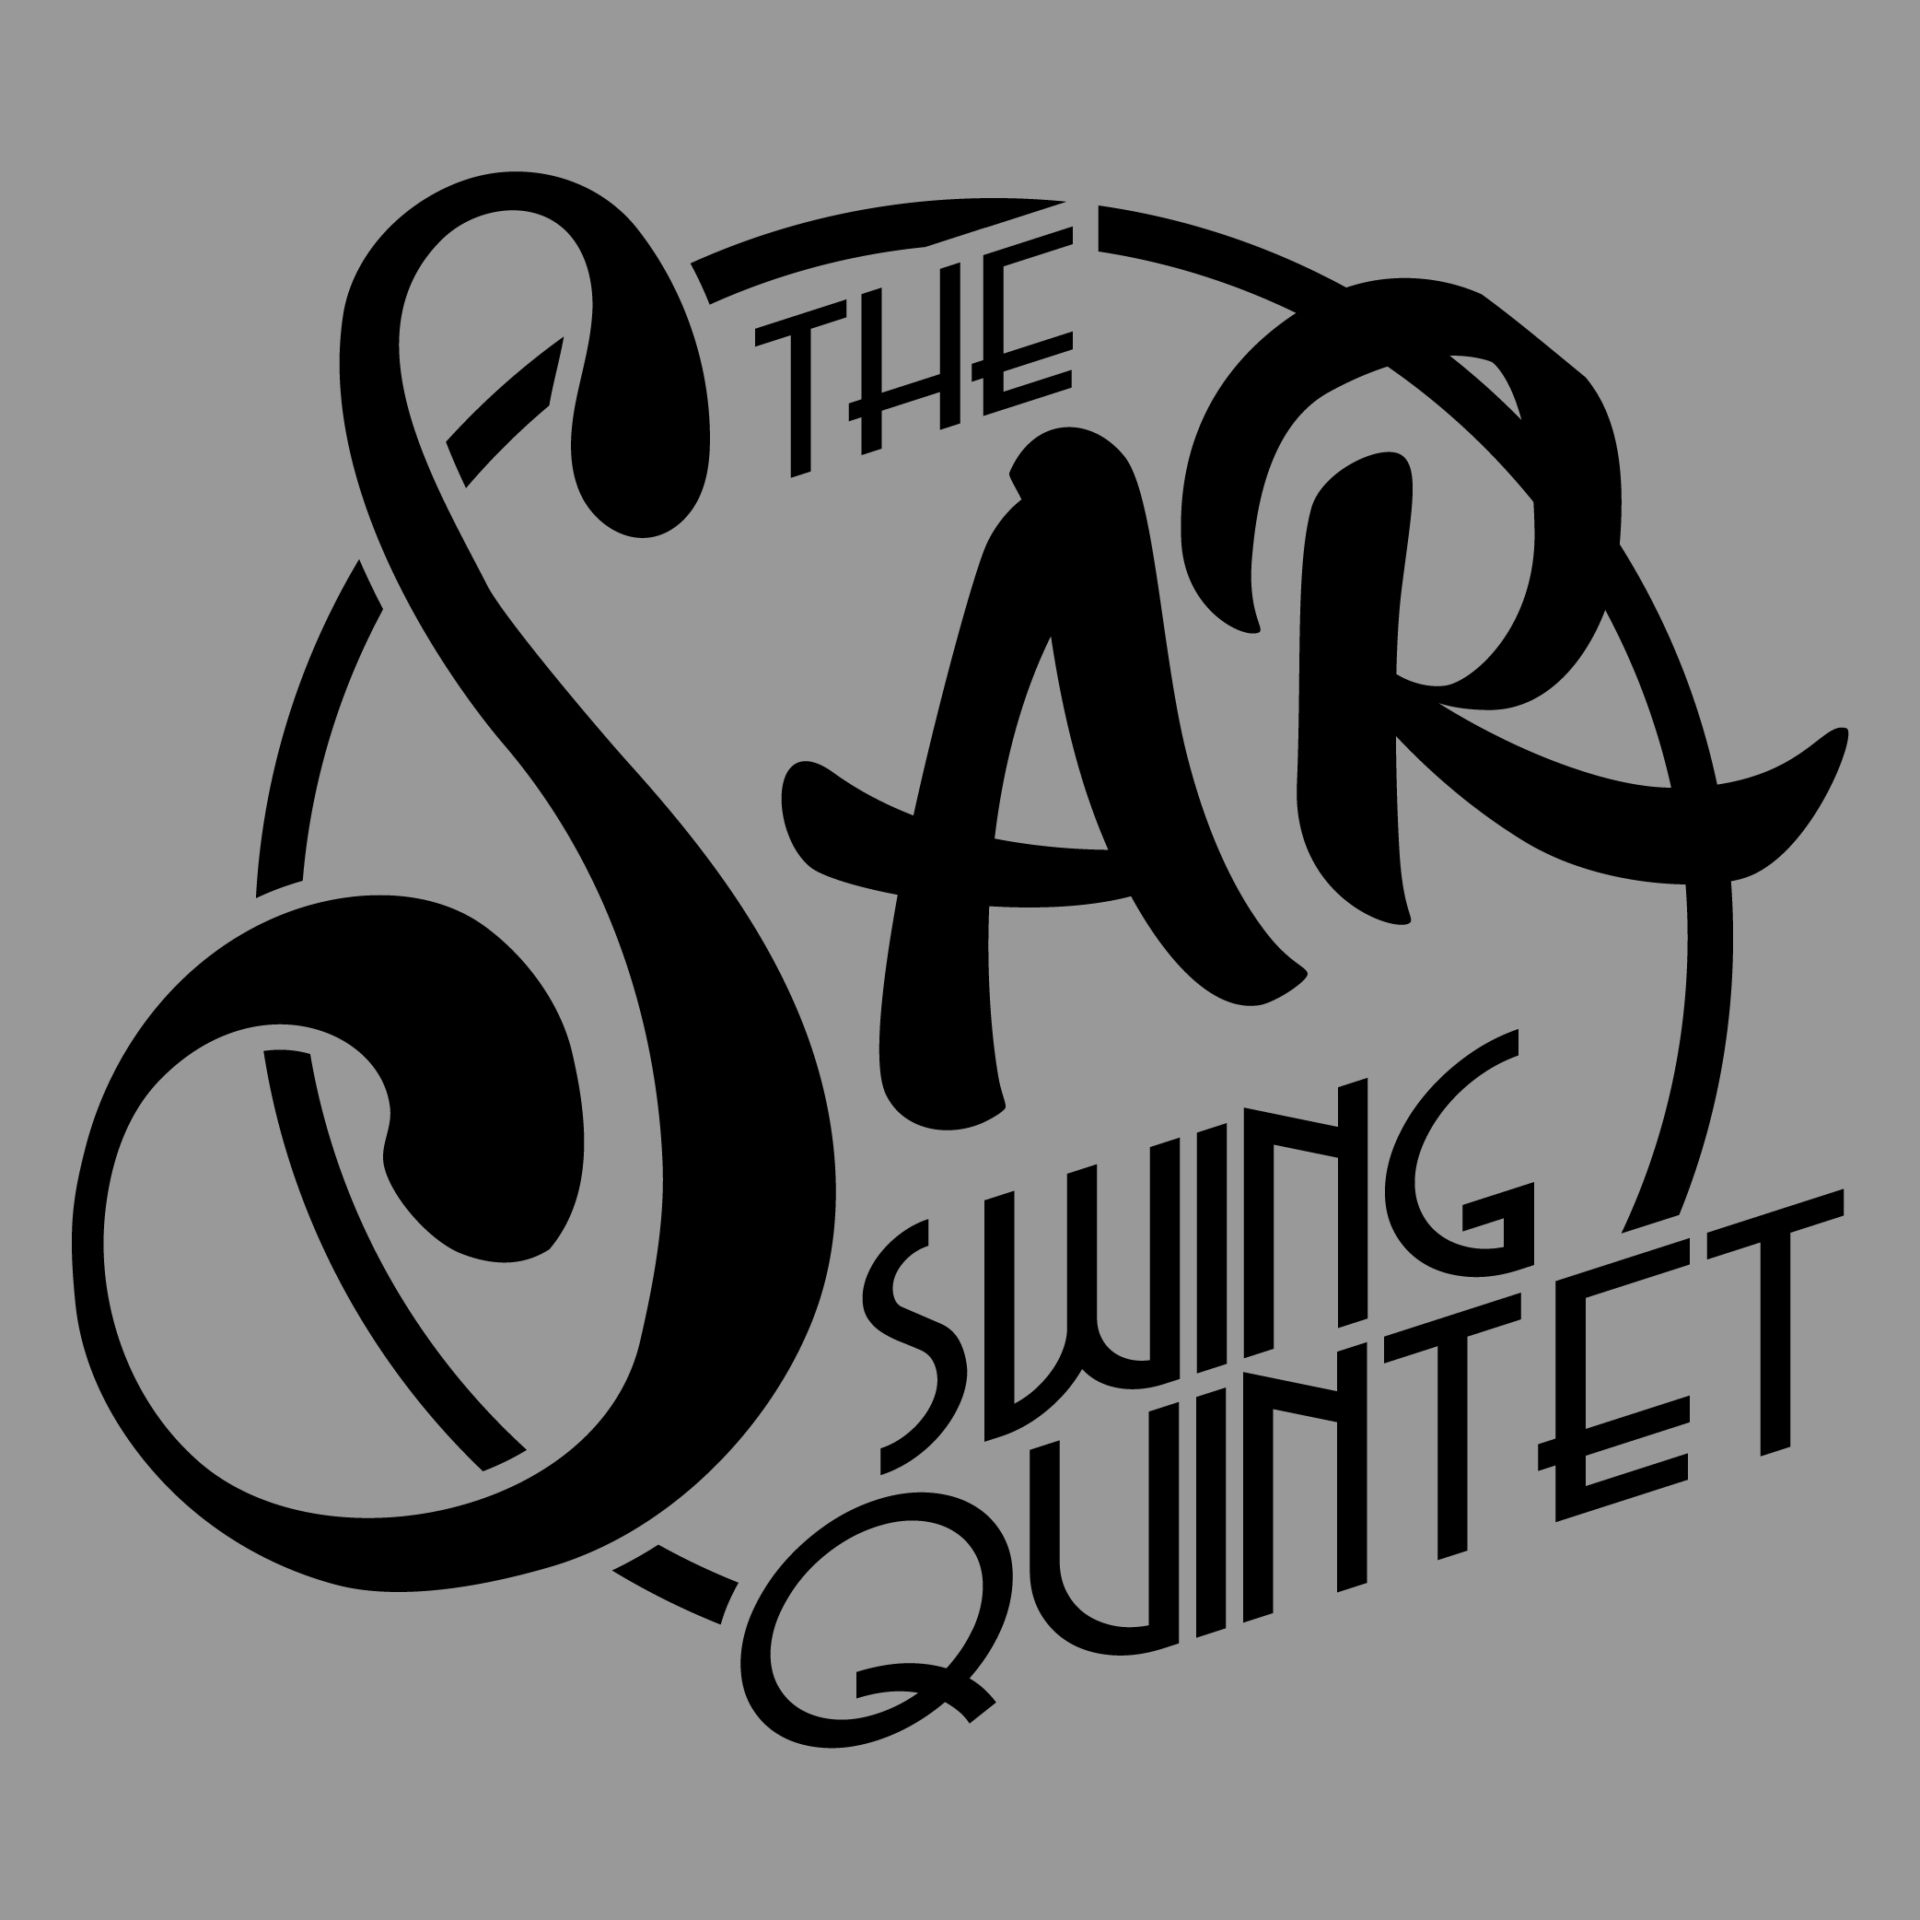 THE SAR SWING QUINTET